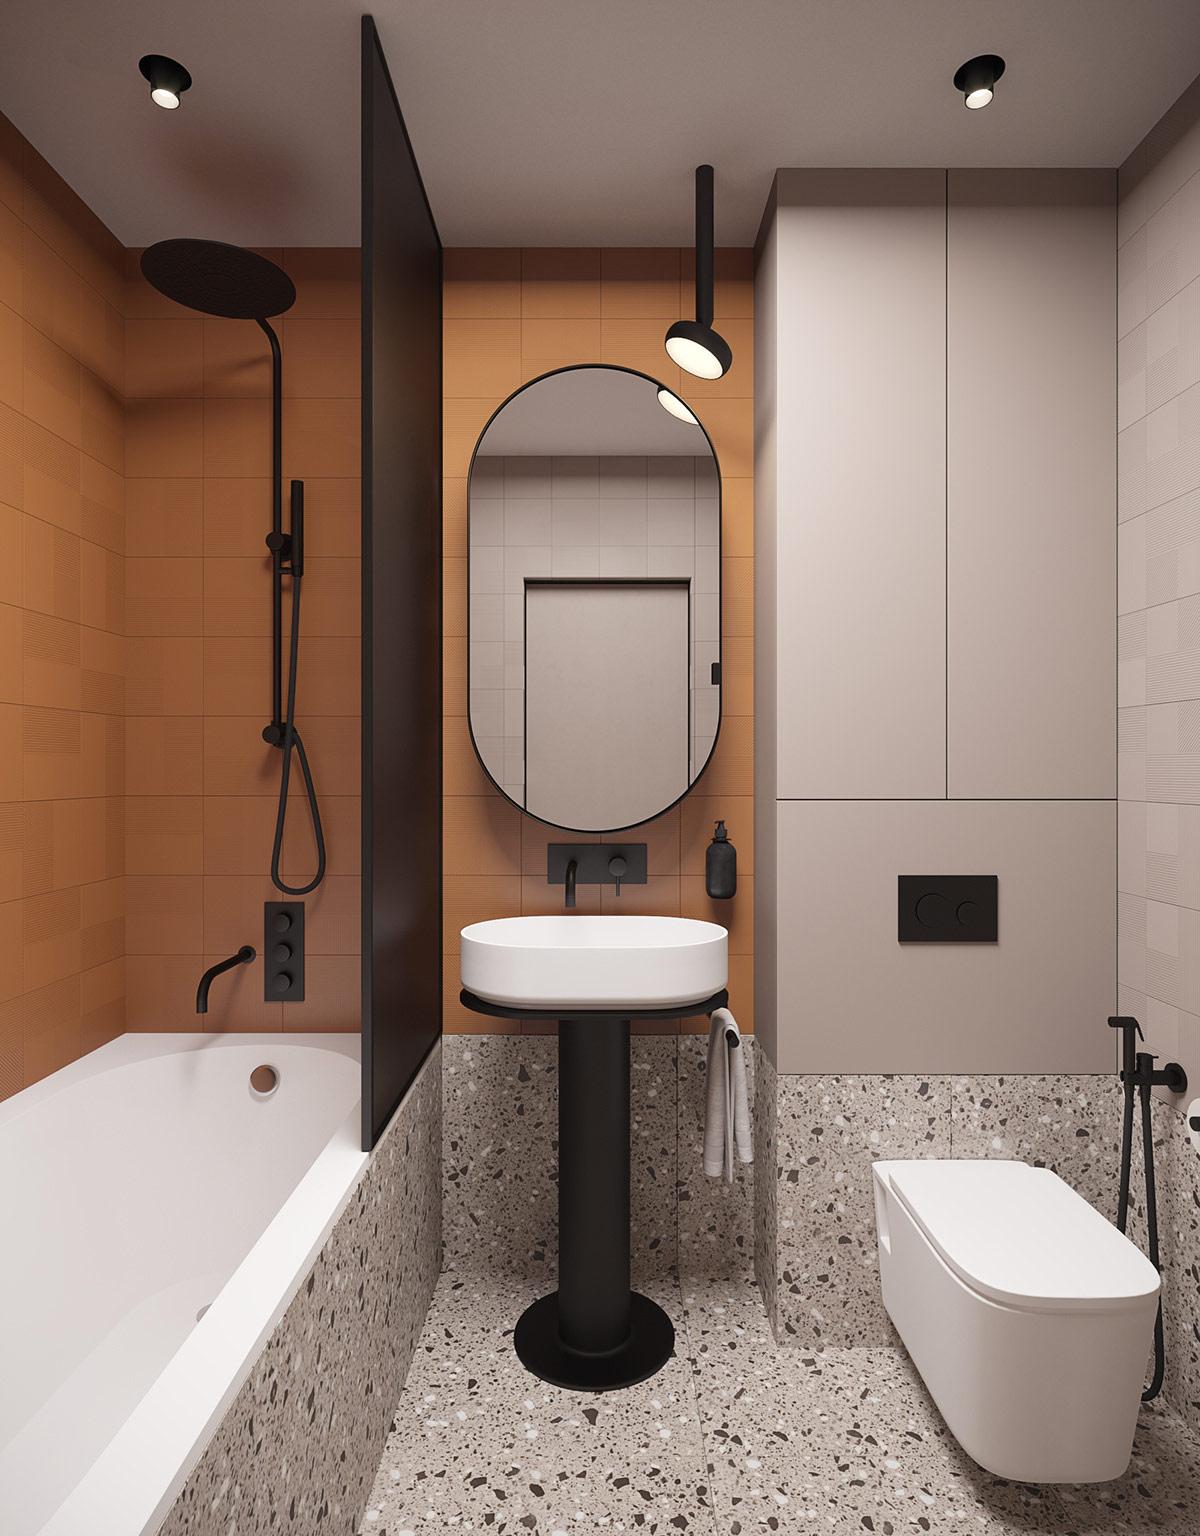 ellipse-vanity-mirror